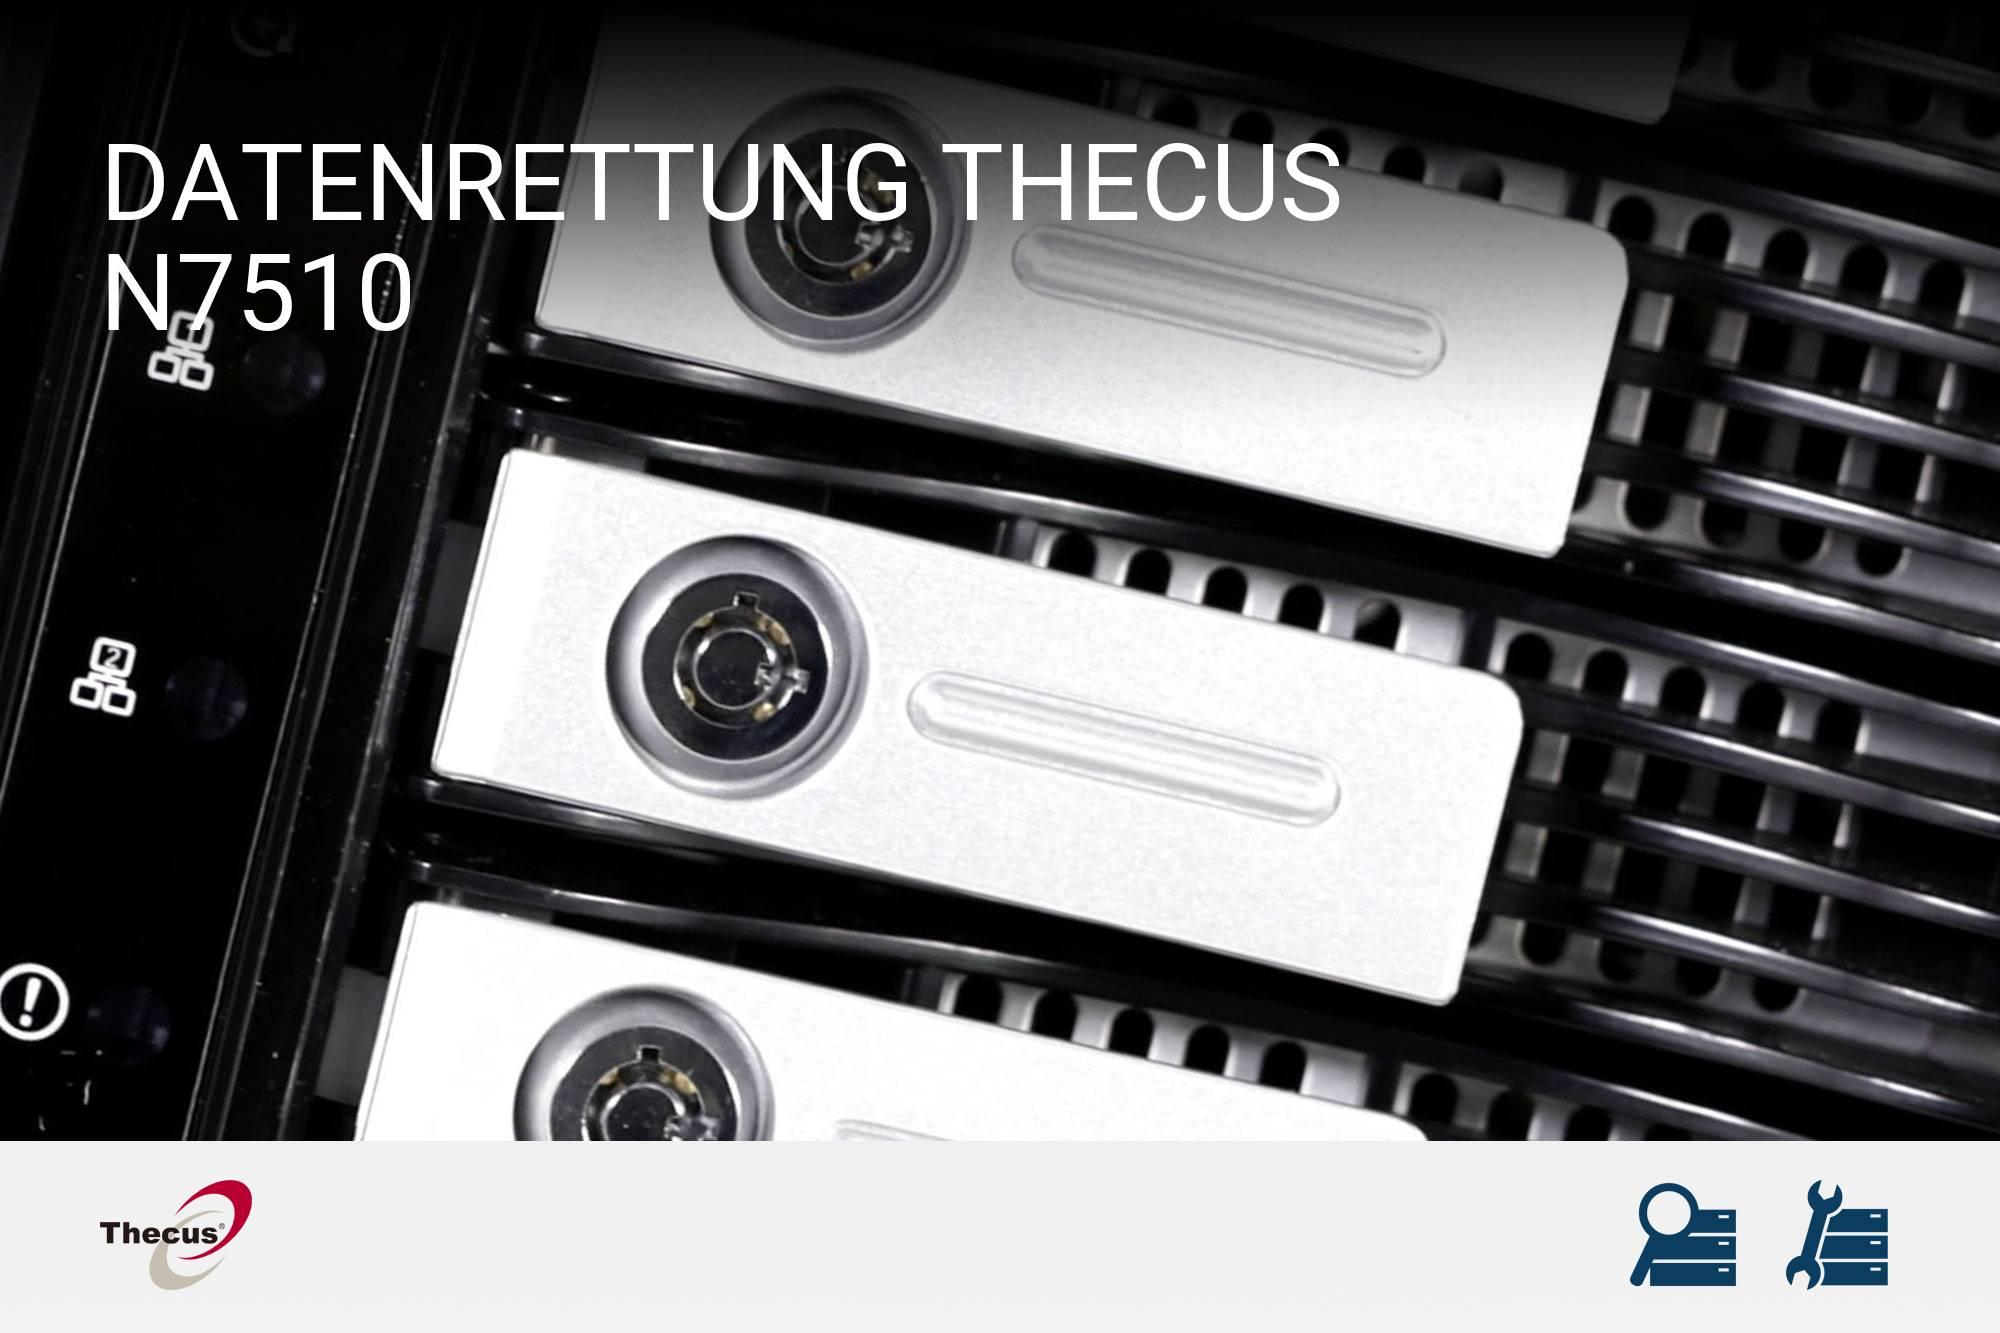 Thecus N7510